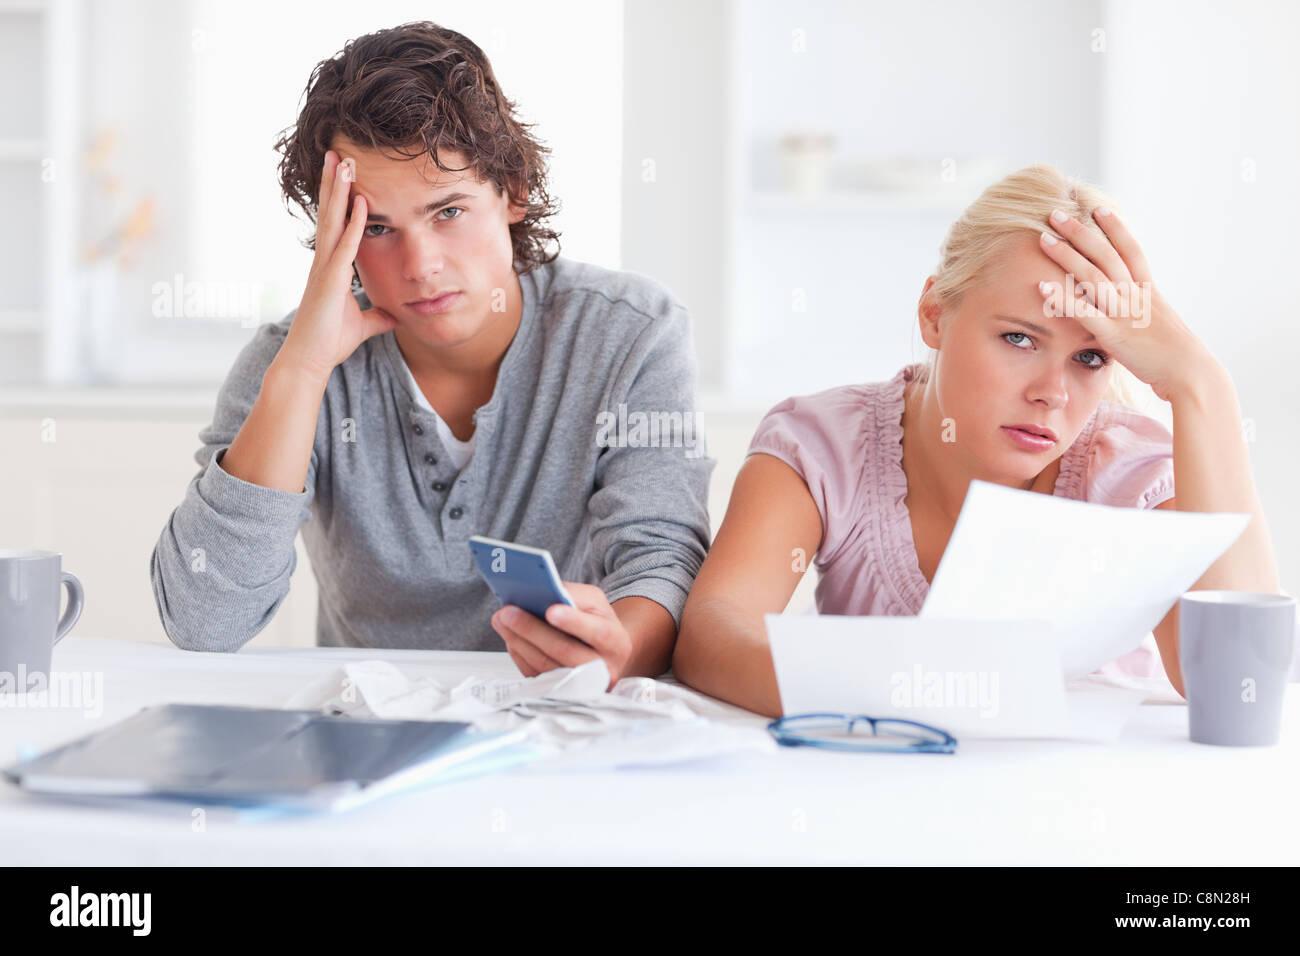 Worn down couple - Stock Image